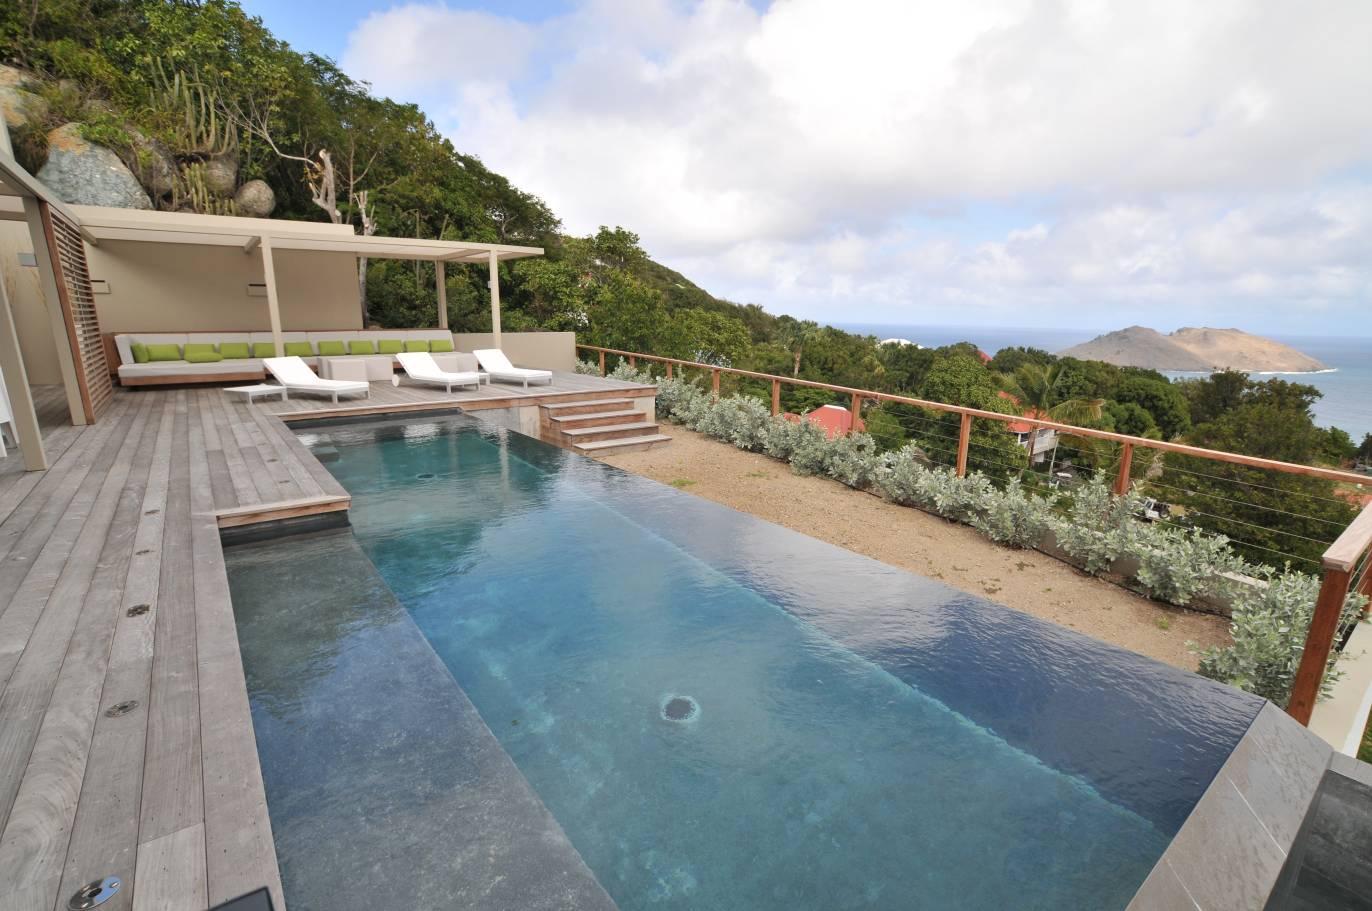 Featured Photo of Infinity Pool Design: No Edges No Boundaries